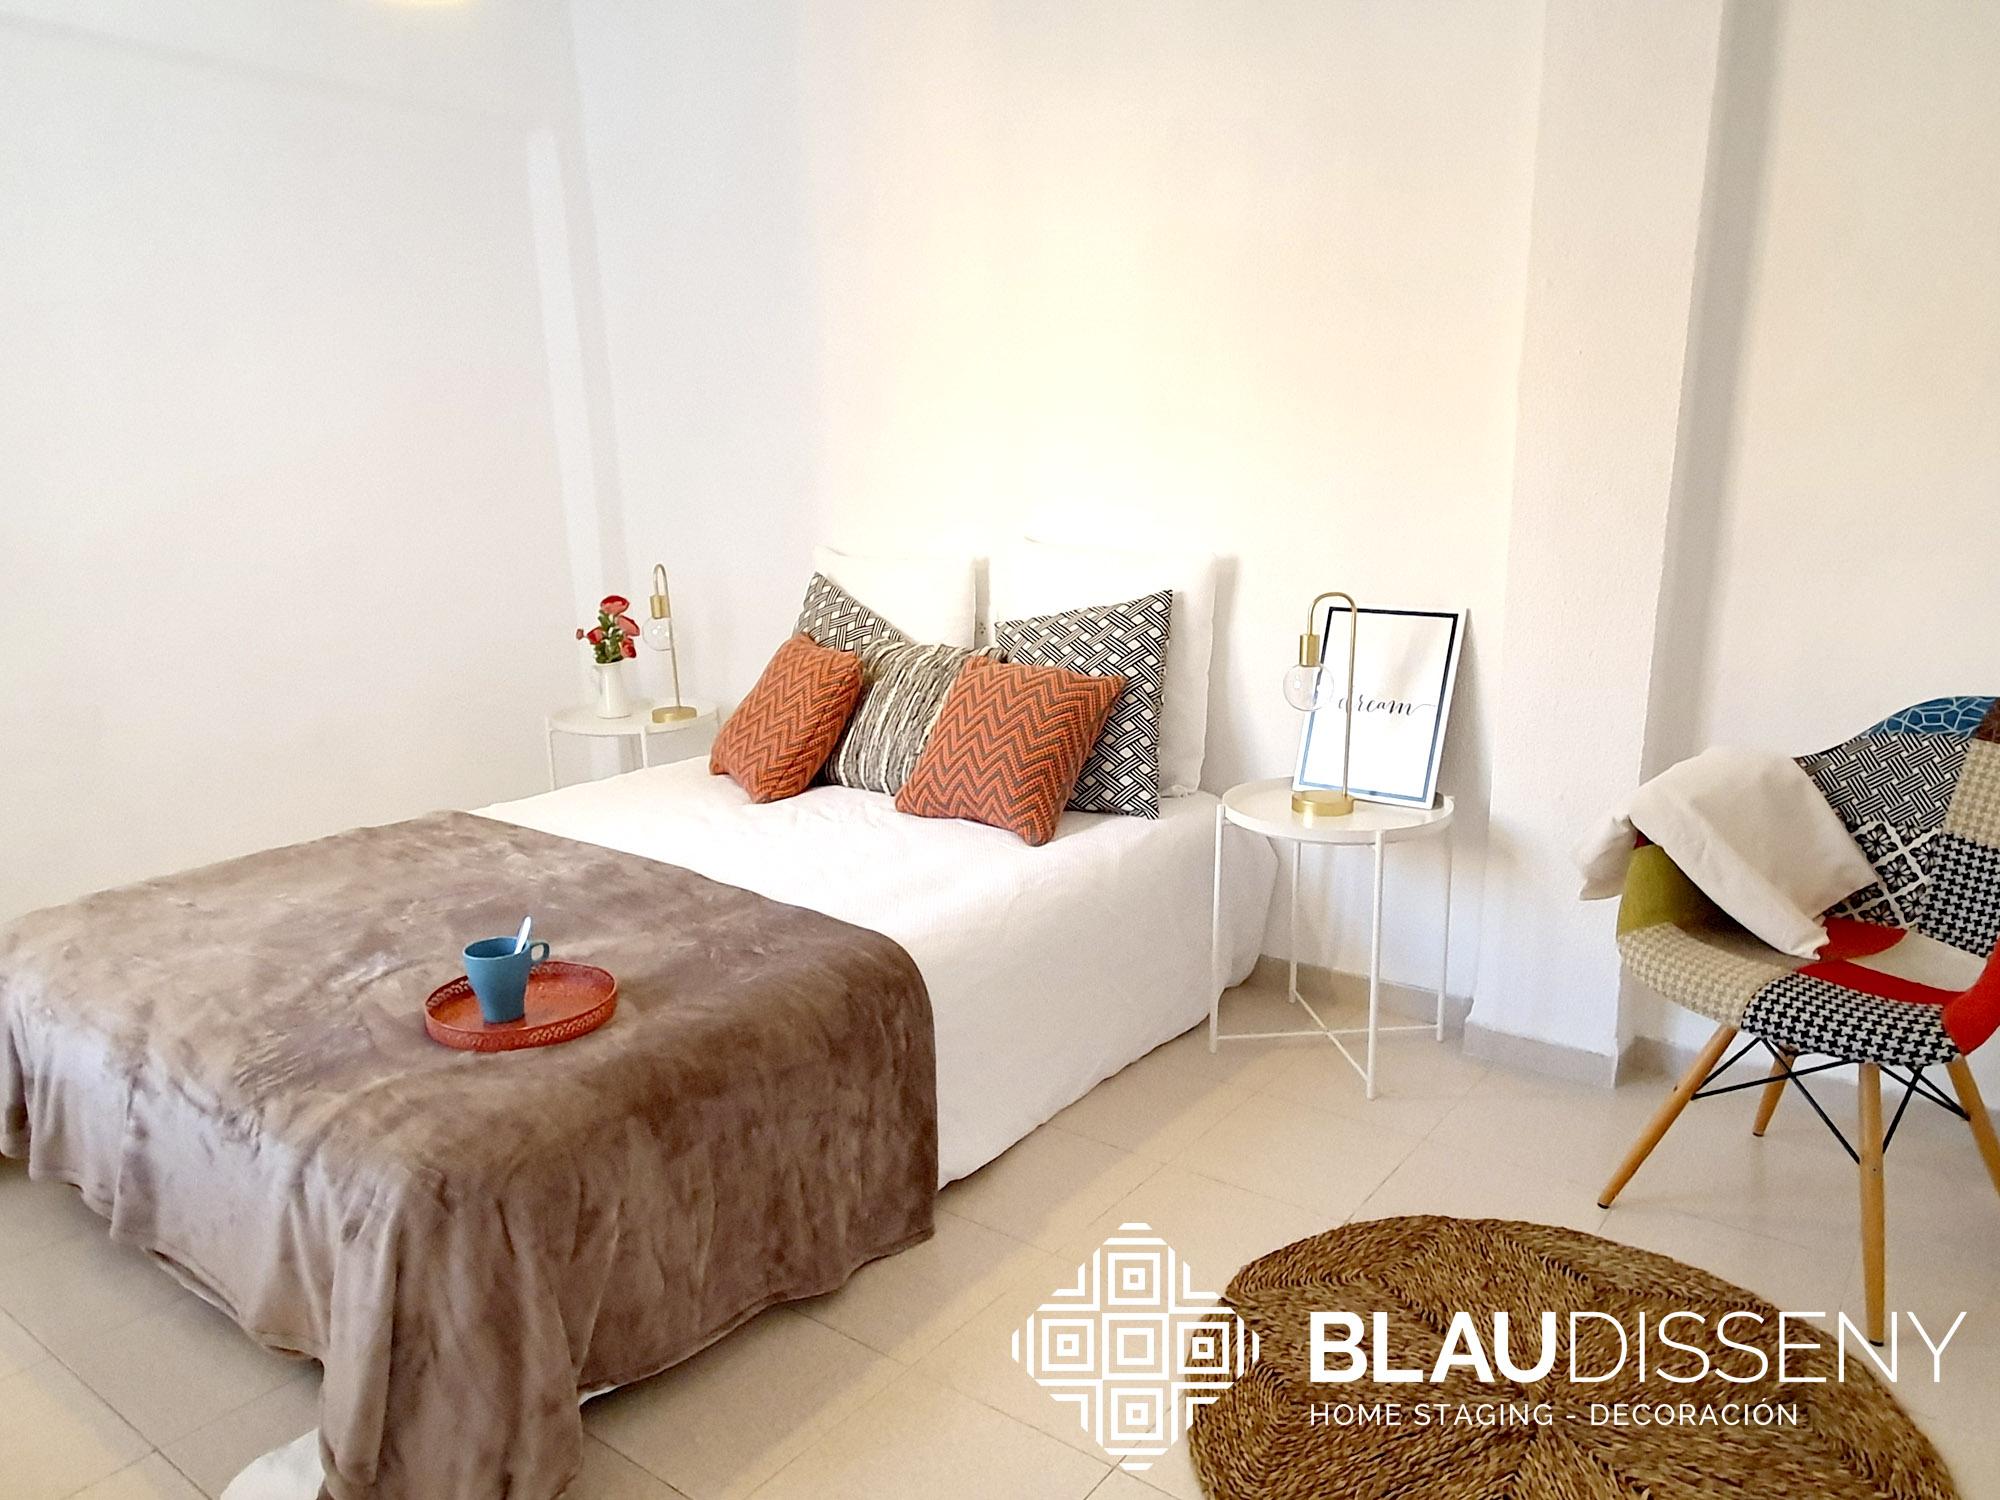 Blaudisseny-home-staging-Son-Cladera-habitacion-matrimonio-despues-logo